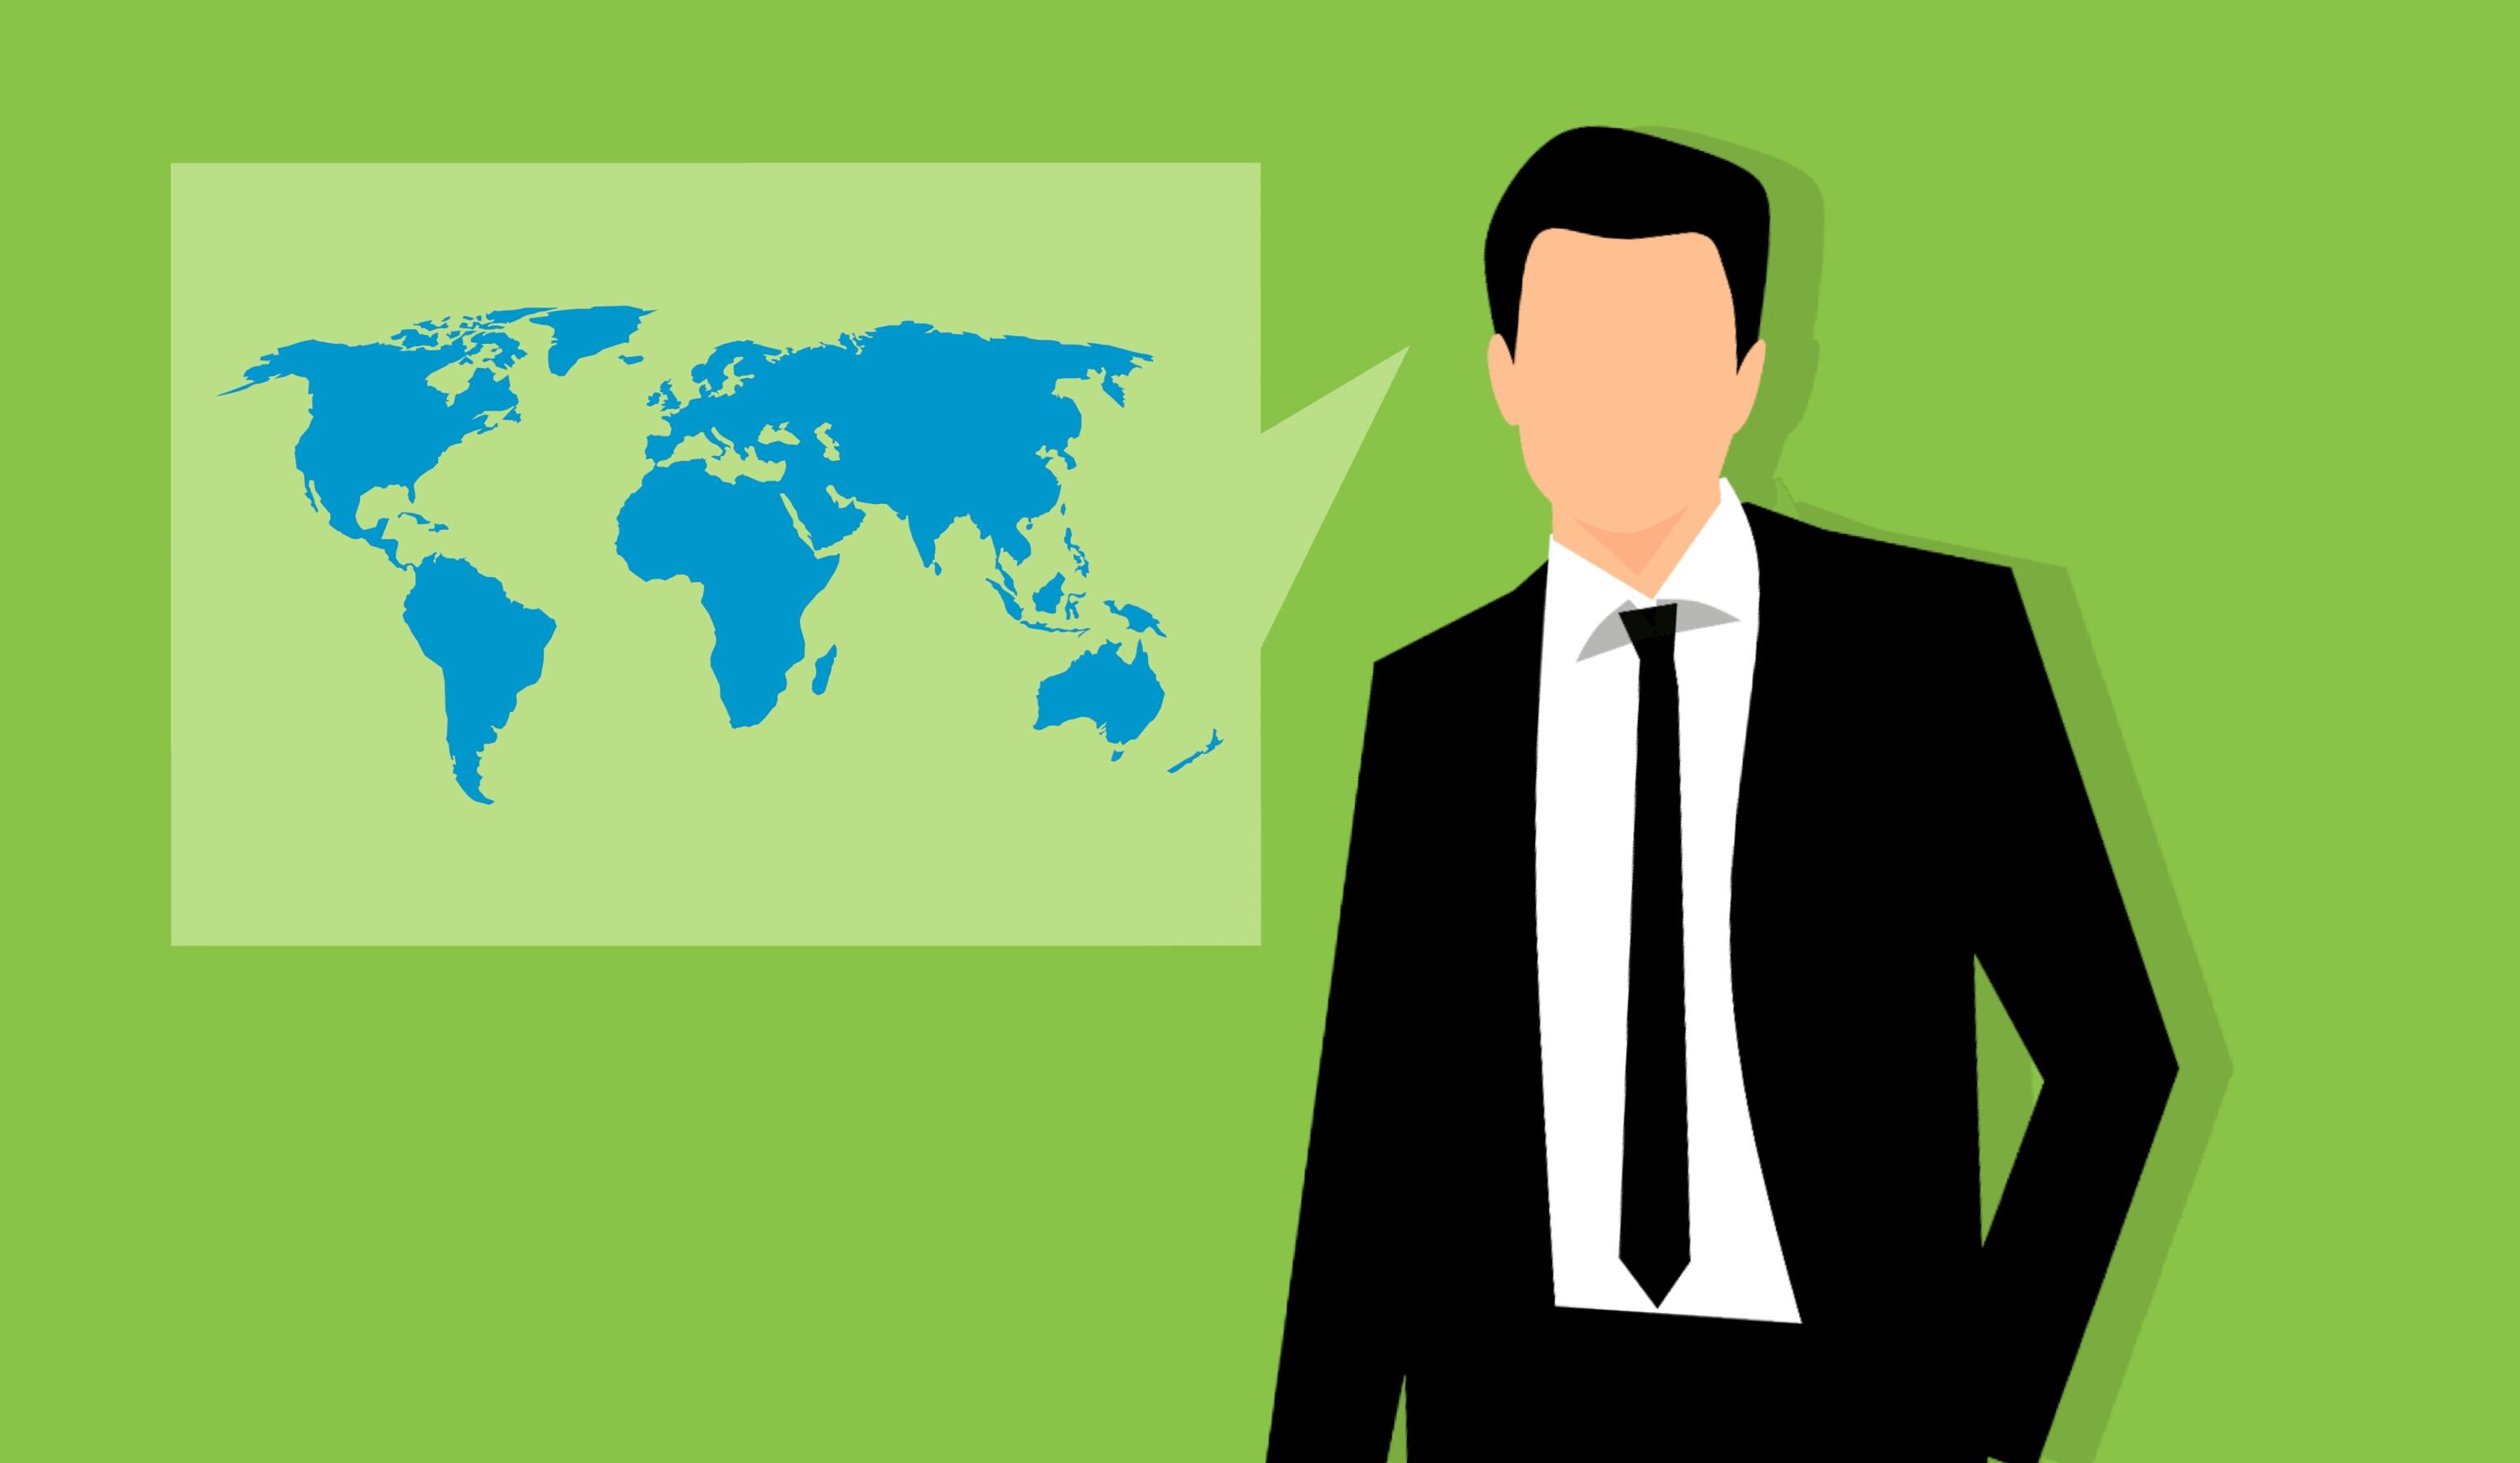 world map earth global continents world international business speaking green human behavior communication font conversation grass